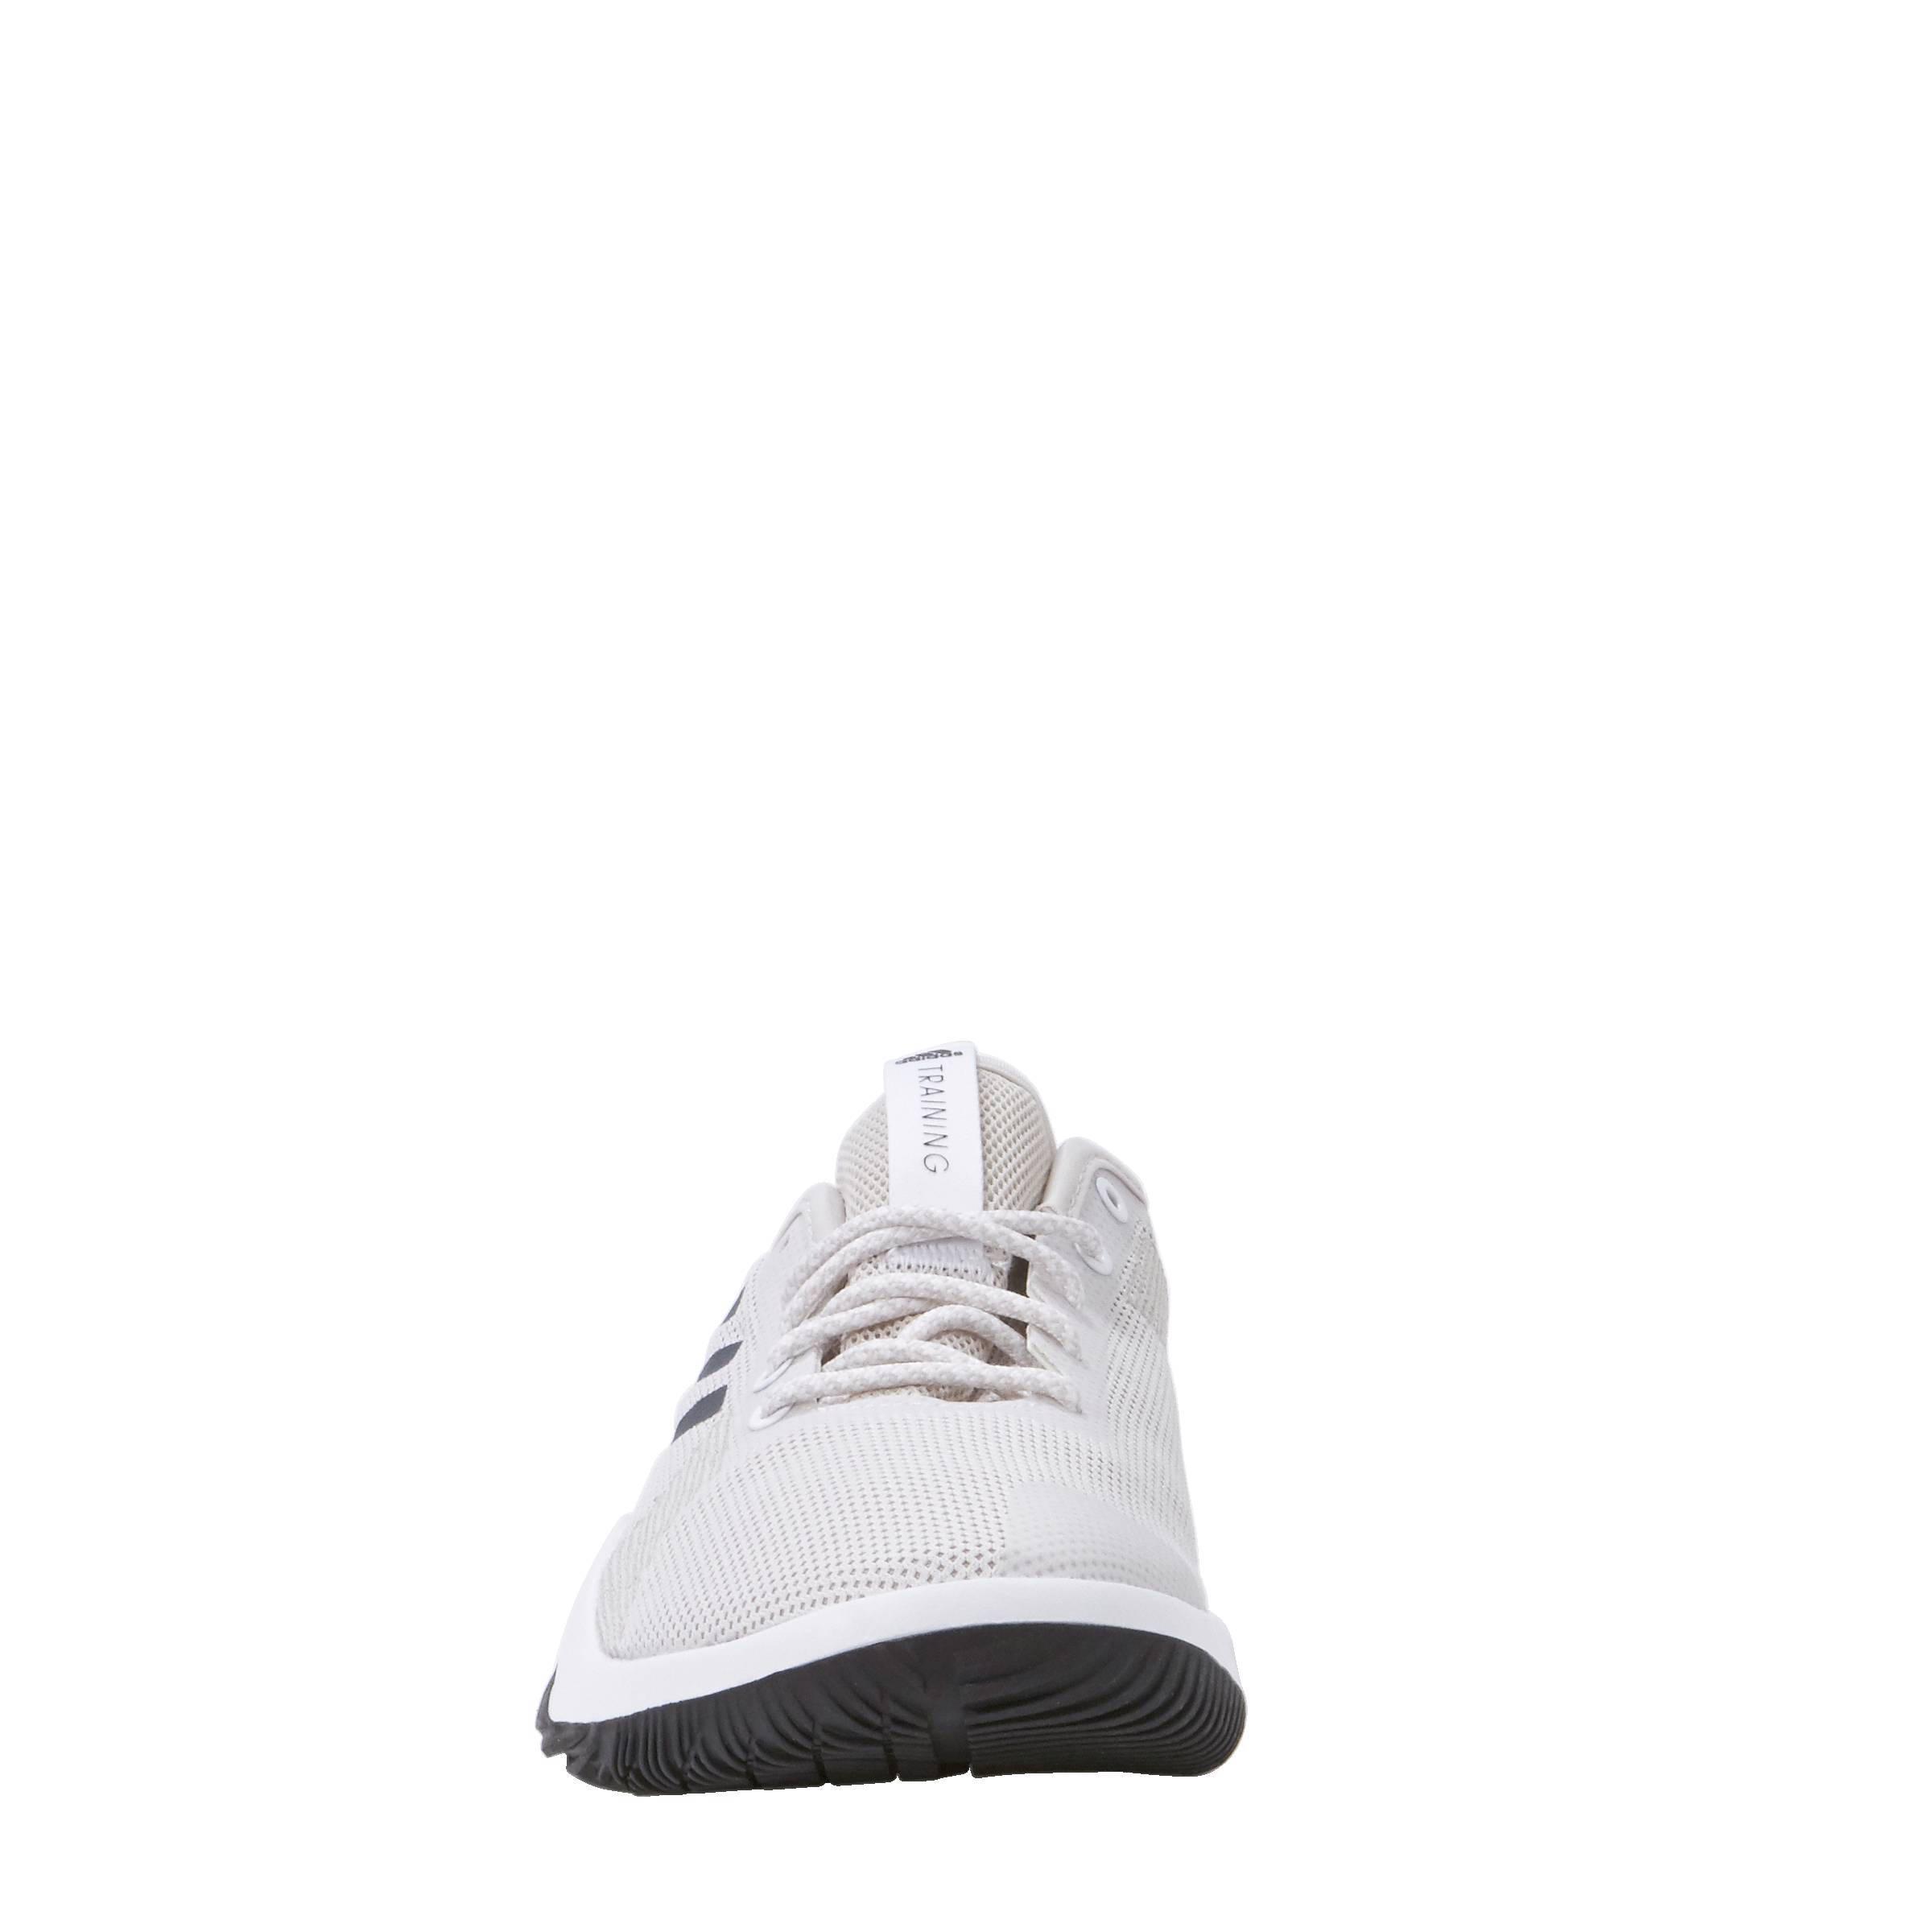 huge discount 2f289 bbf6c adidas performance Crazy Train LT M fitness schoenen  wehkam